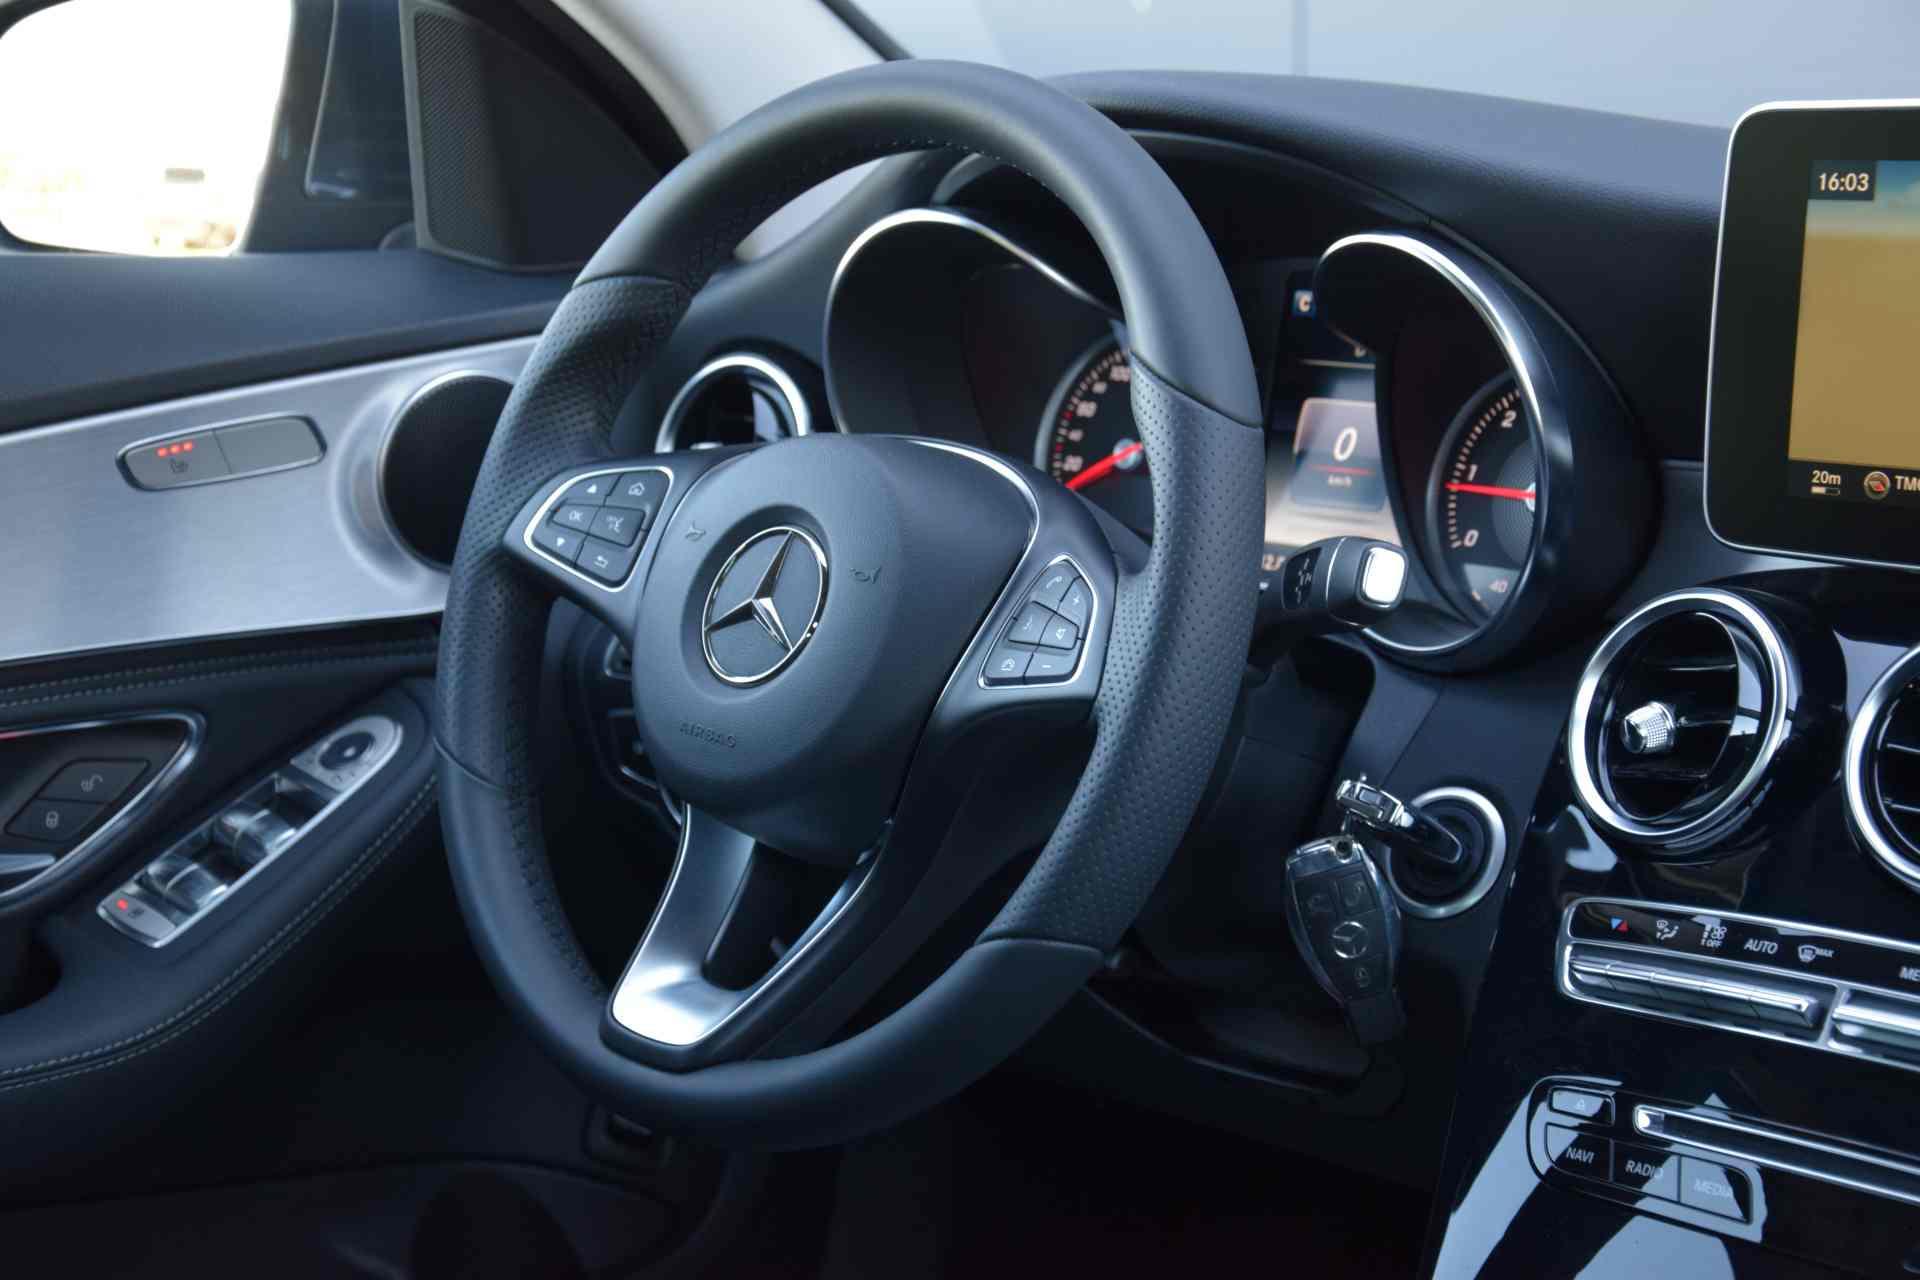 Mercedes-Benz C 220 d BlueTec AMG-Line 06/2014 – 74.000 km!!